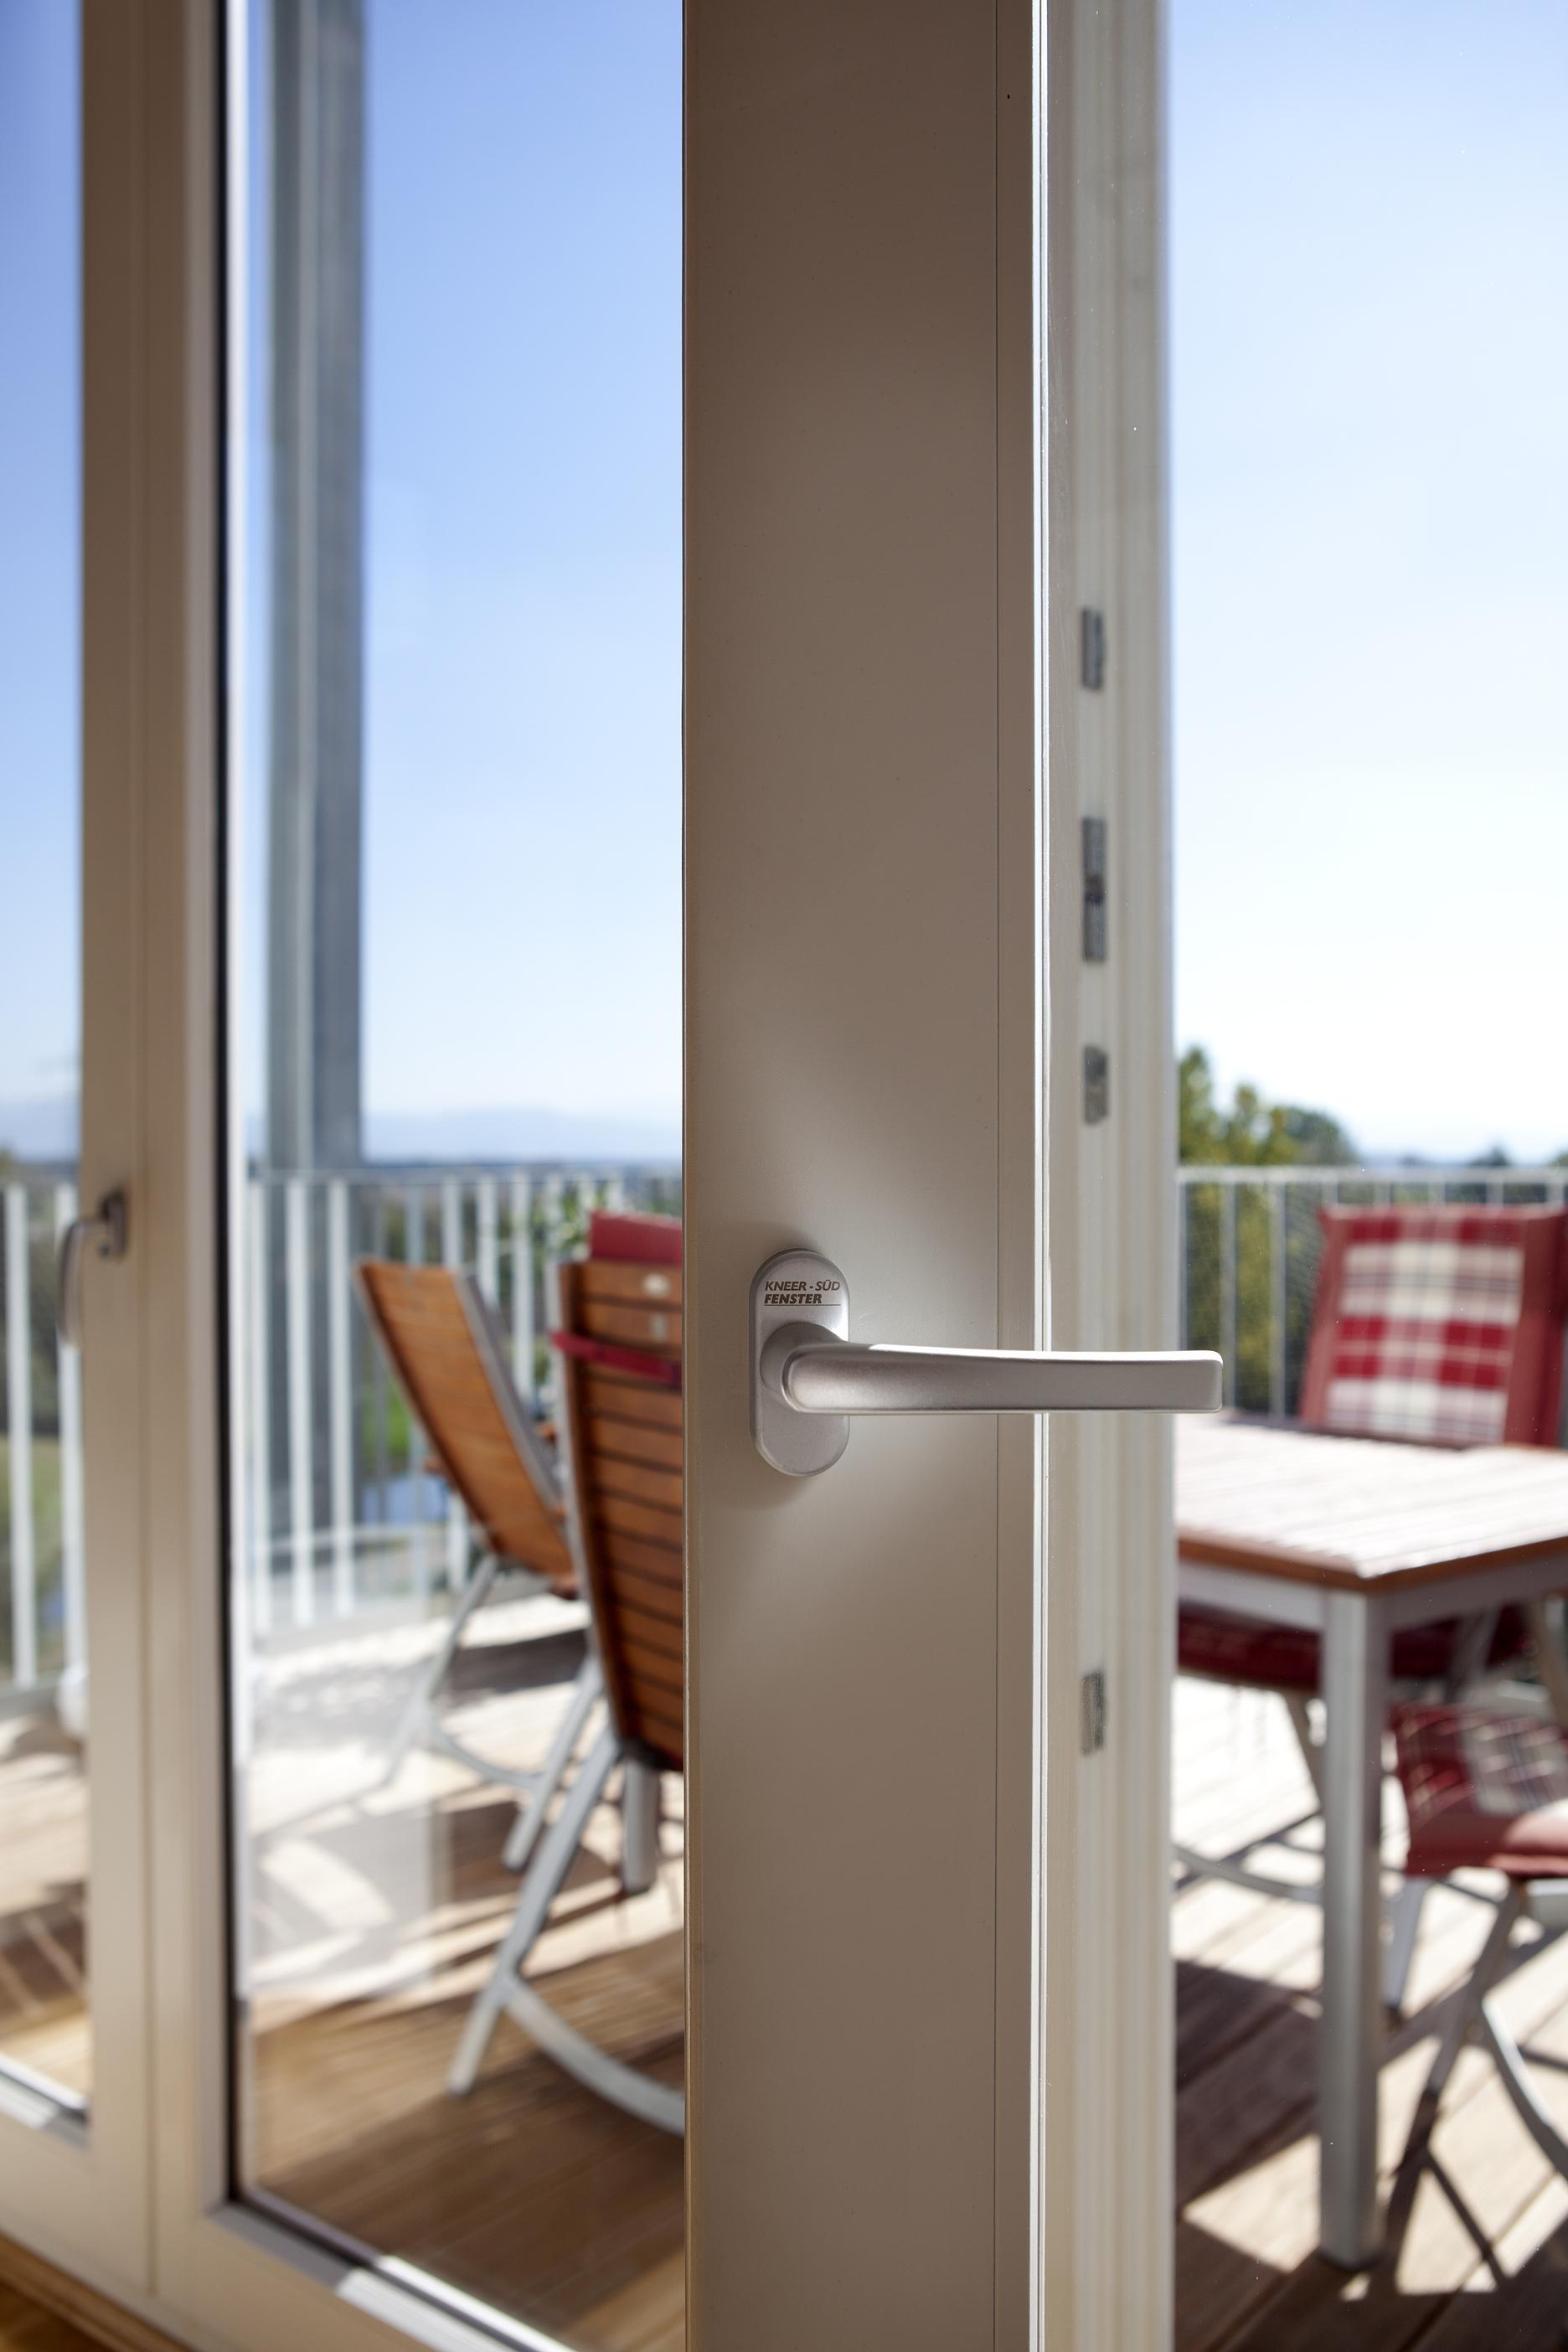 terrassent ren glas rapp duschkabinen glast ren glasvord cher fenster haust ren uvm. Black Bedroom Furniture Sets. Home Design Ideas